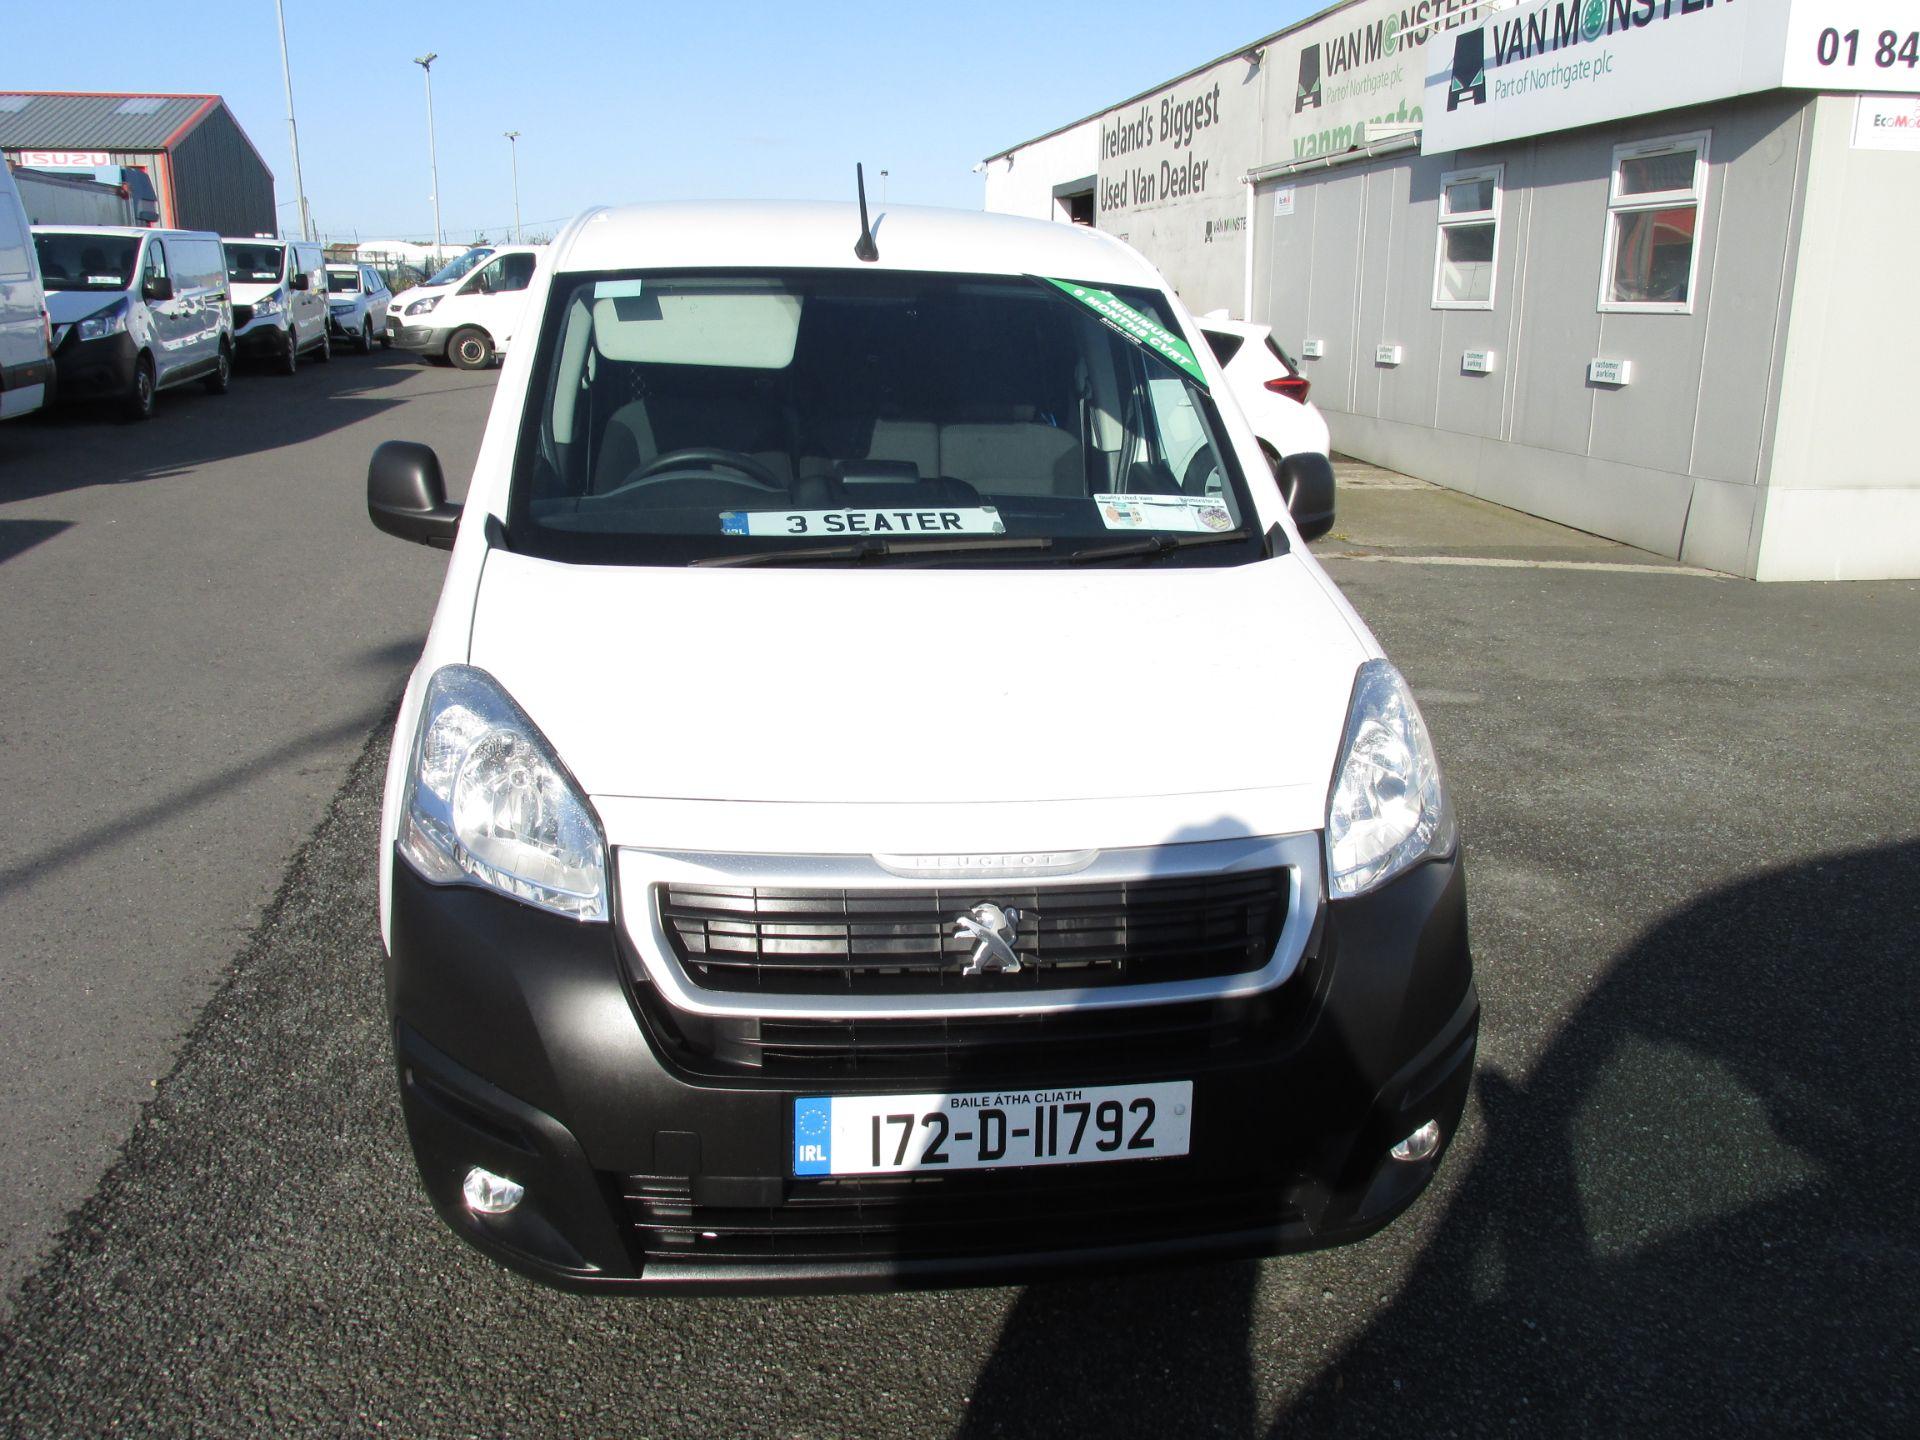 2017 Peugeot Partner 3 SEATER (172D11792) Image 2